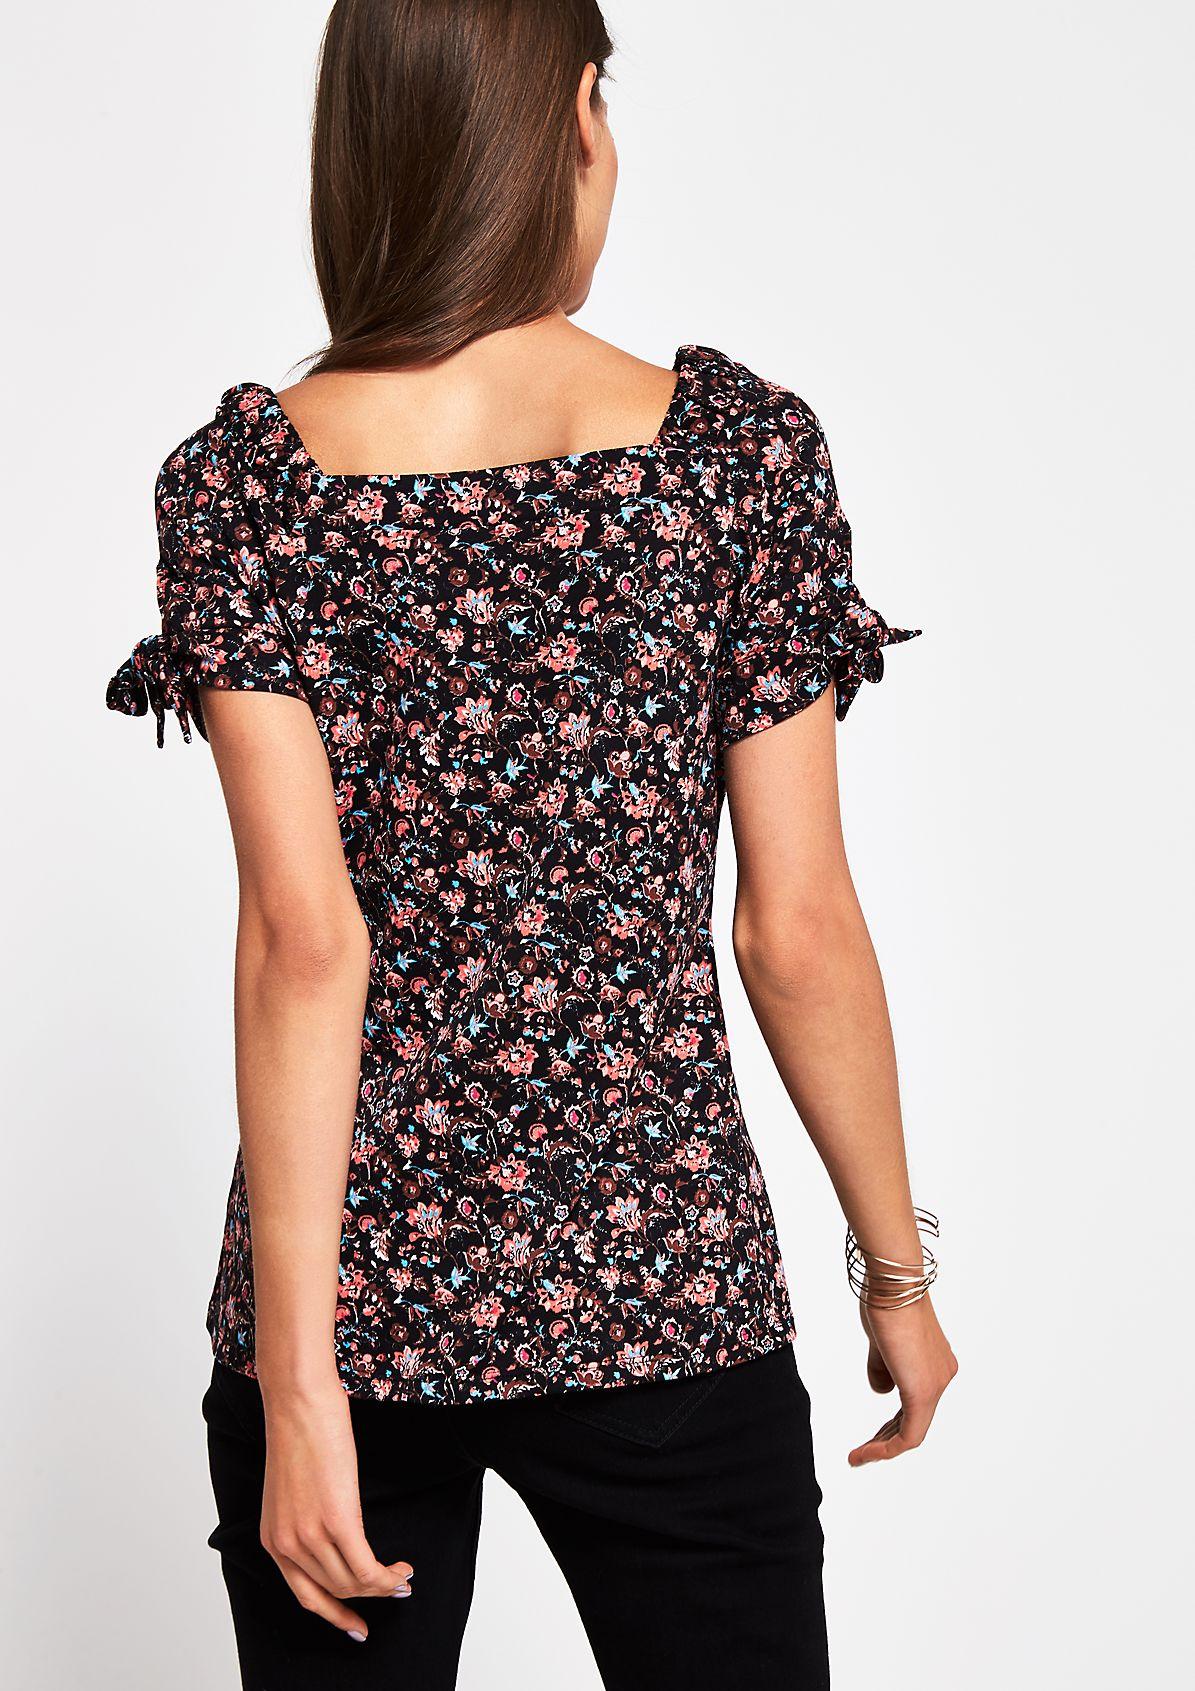 Jerseyshirt mit farbenfrohem Alloverprint